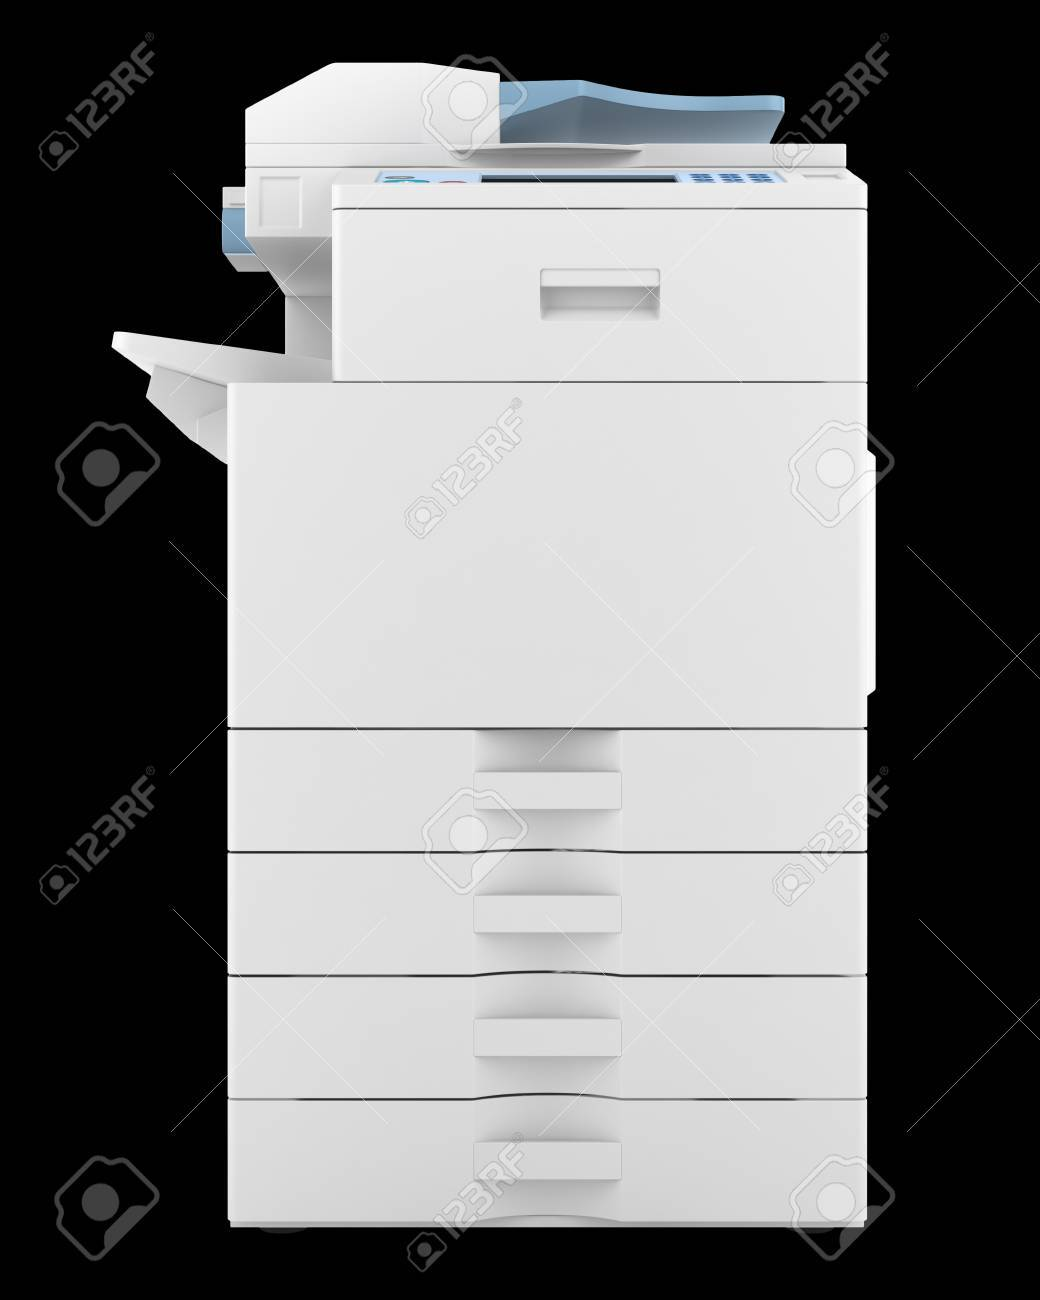 modern office multifunction printer isolated on black background Stock Photo - 20840244